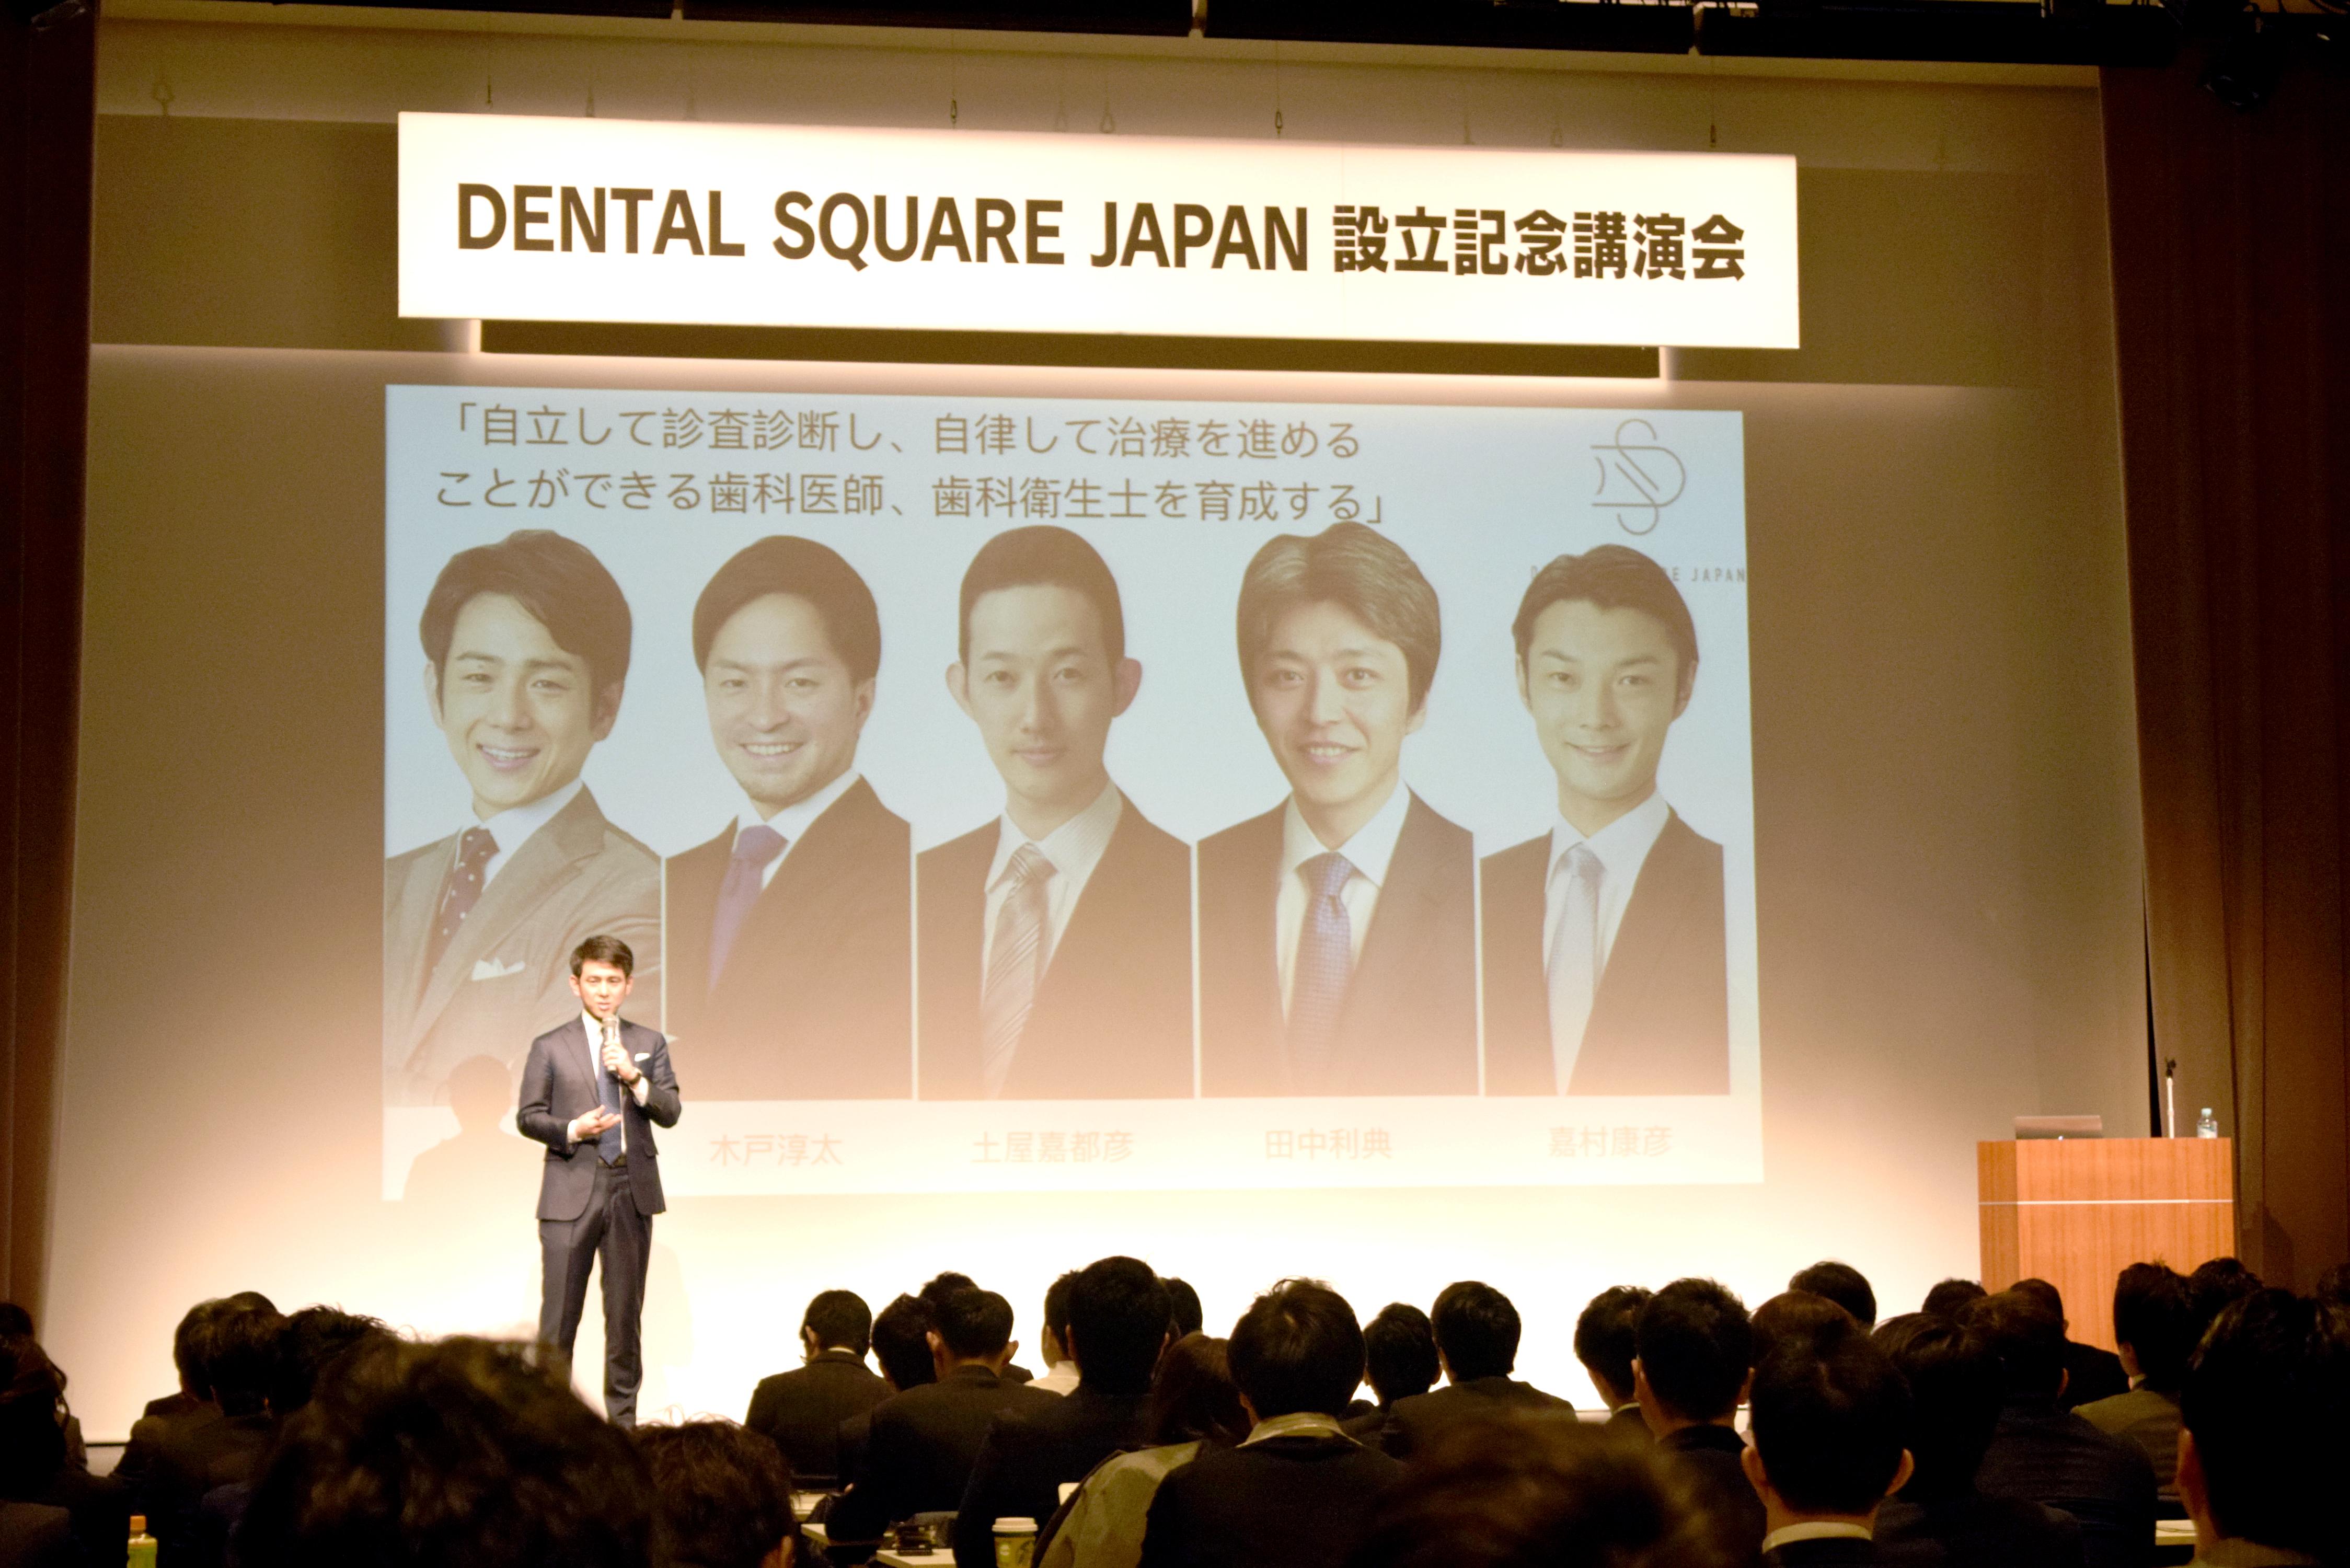 DENTAL SQUARE JAPAN設立記念講演会